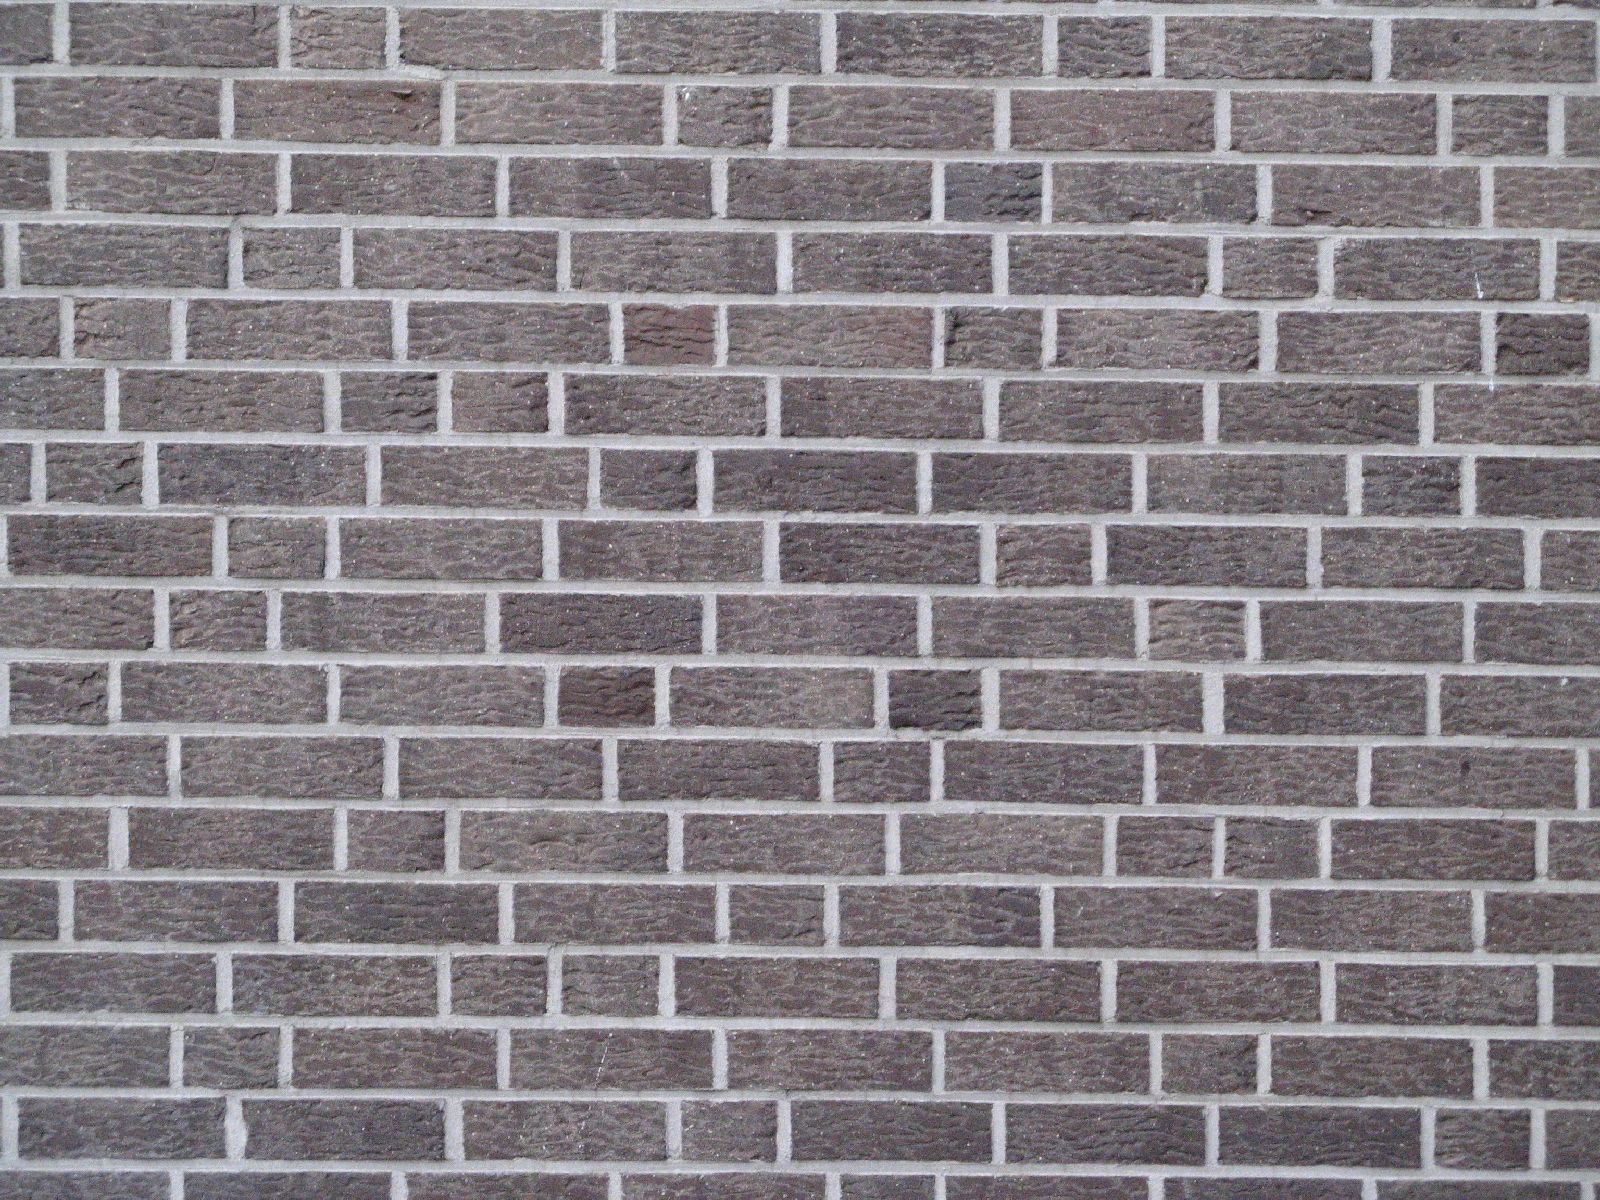 Brick_Texture_B_03726